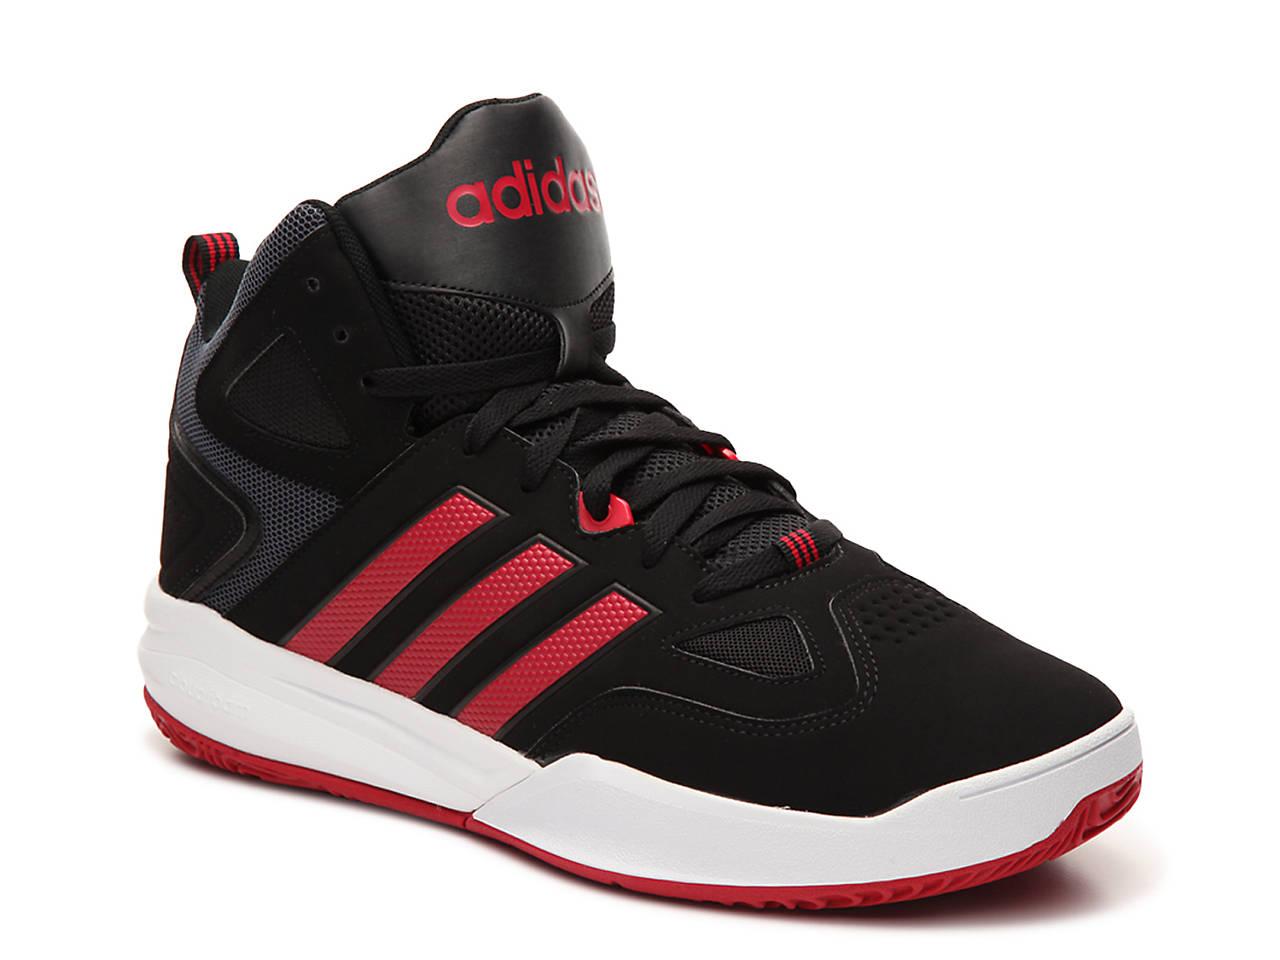 Adidas NEO High Tops Popular